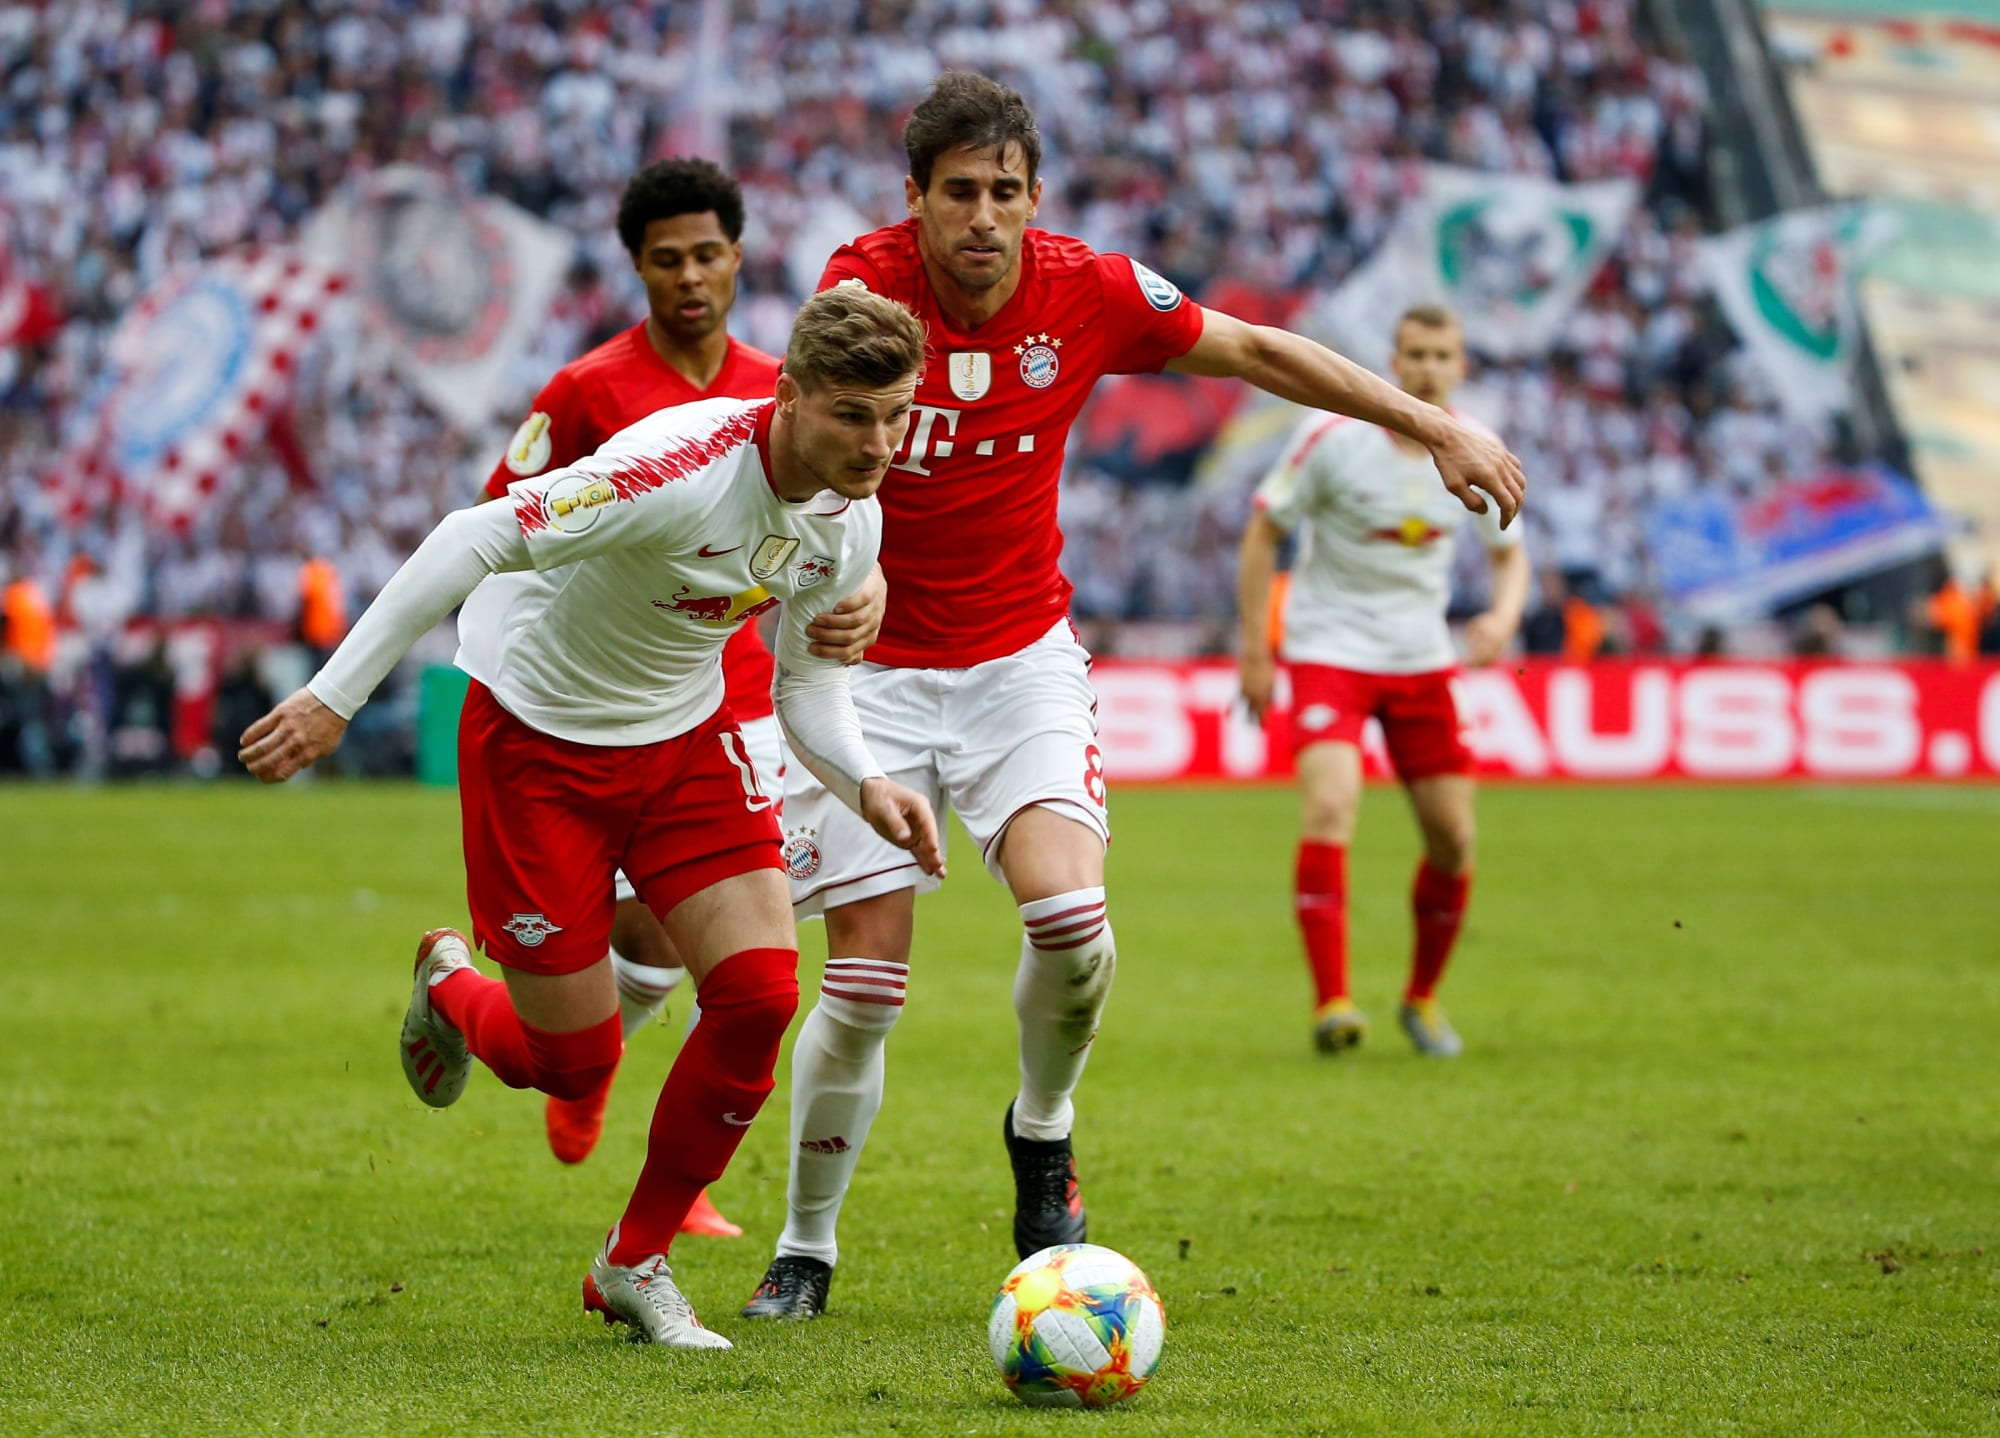 Rb Leipzig - Bayern München